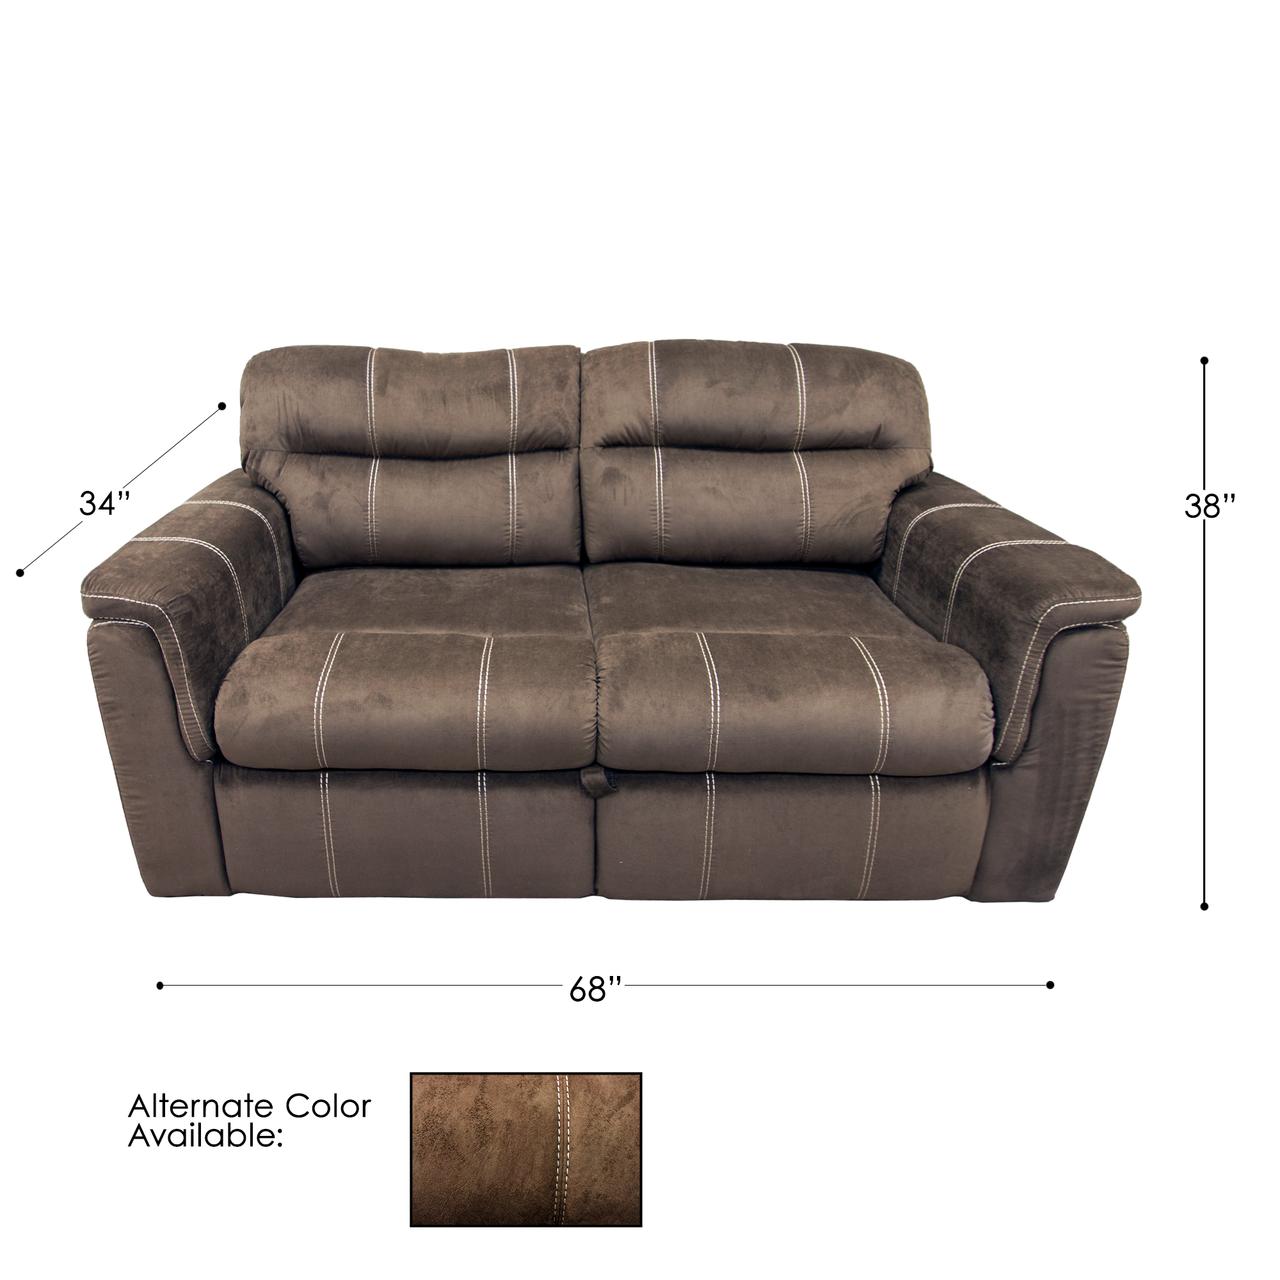 Suede Mocha 68 Rv Sleeper Sofa Parts Nation